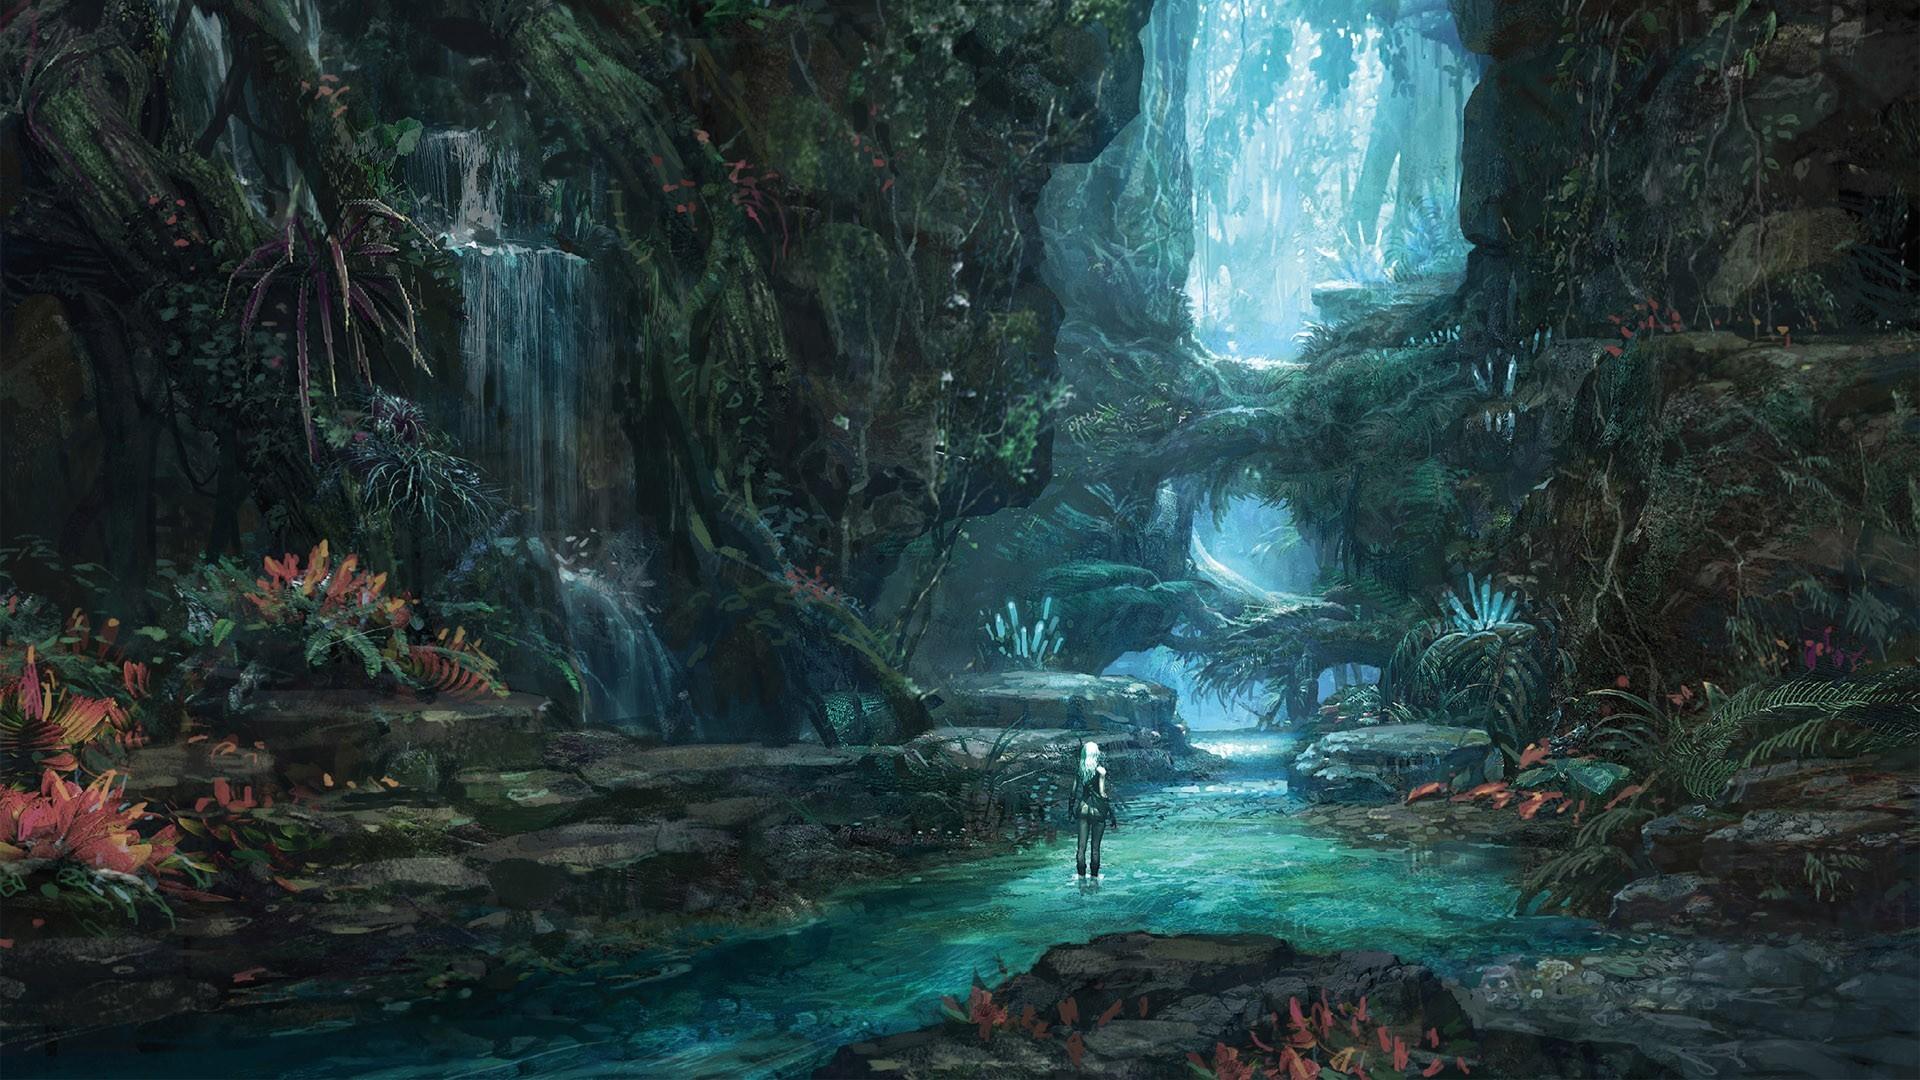 Fantasy Landscape: Forest -All credit to the original artist-